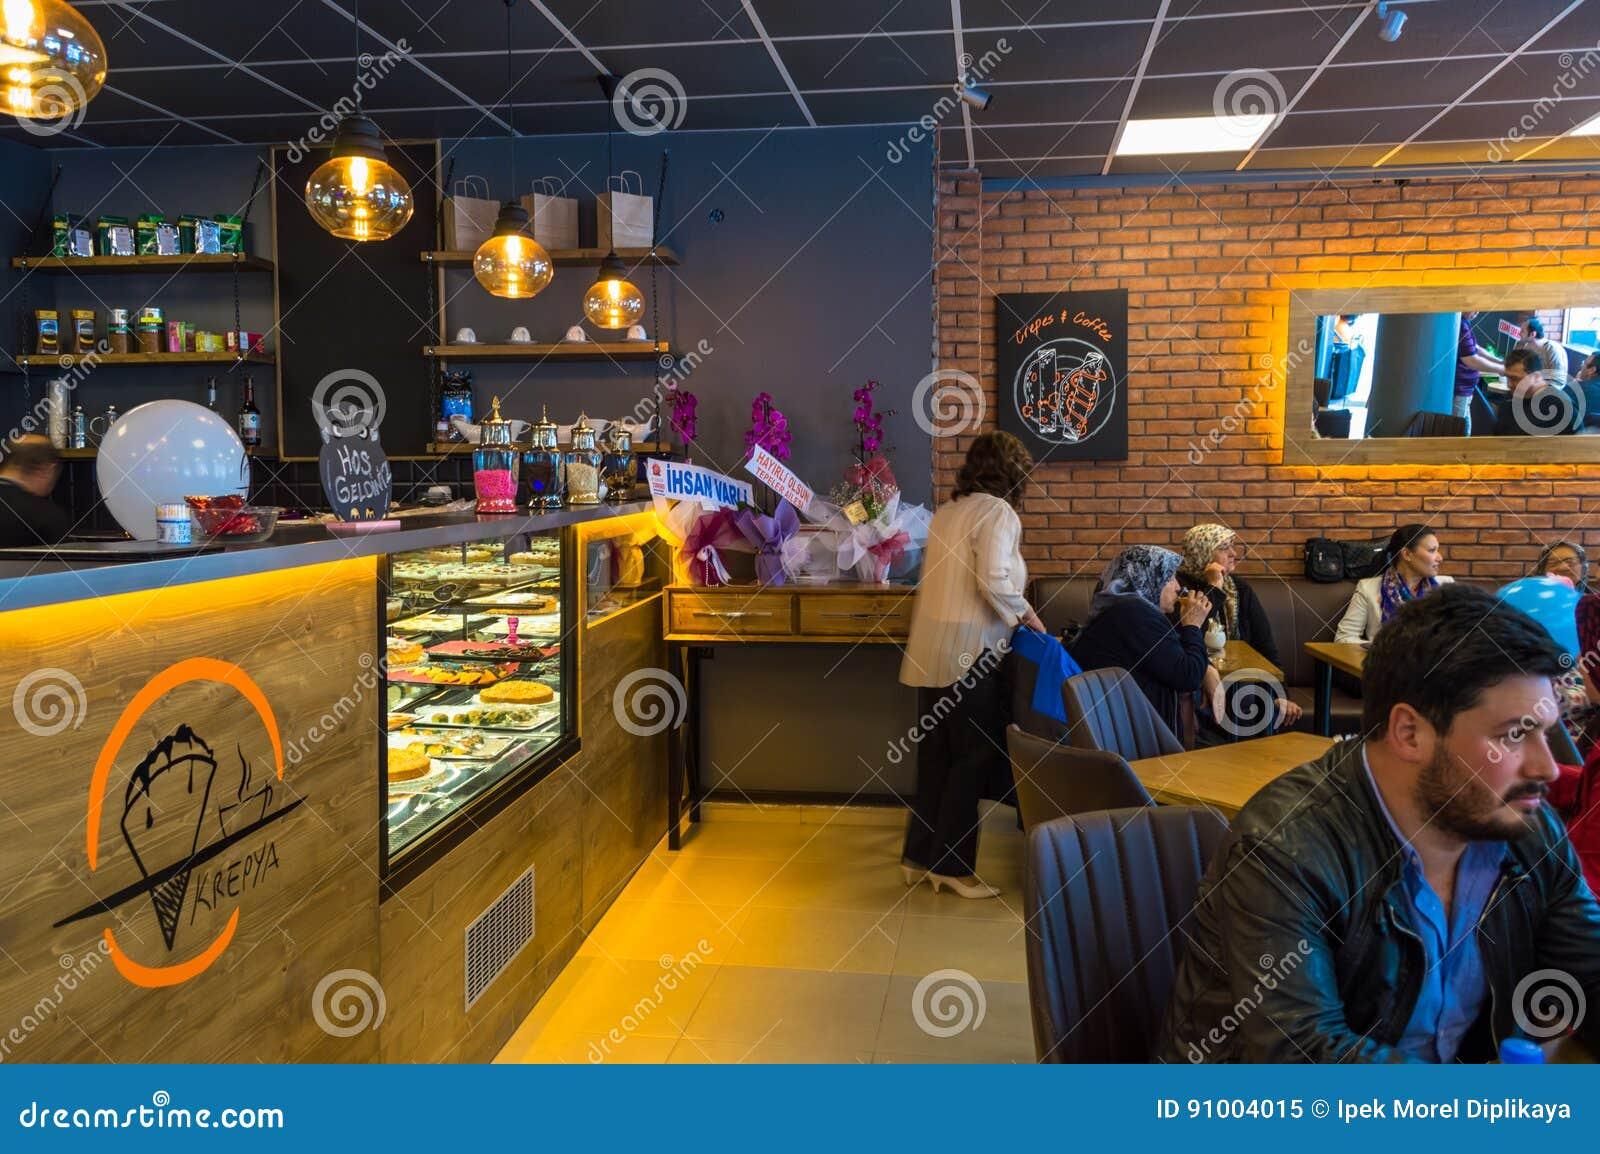 Eskisehir, Turkey - April 15, 2017: People sitting in a cafe shop